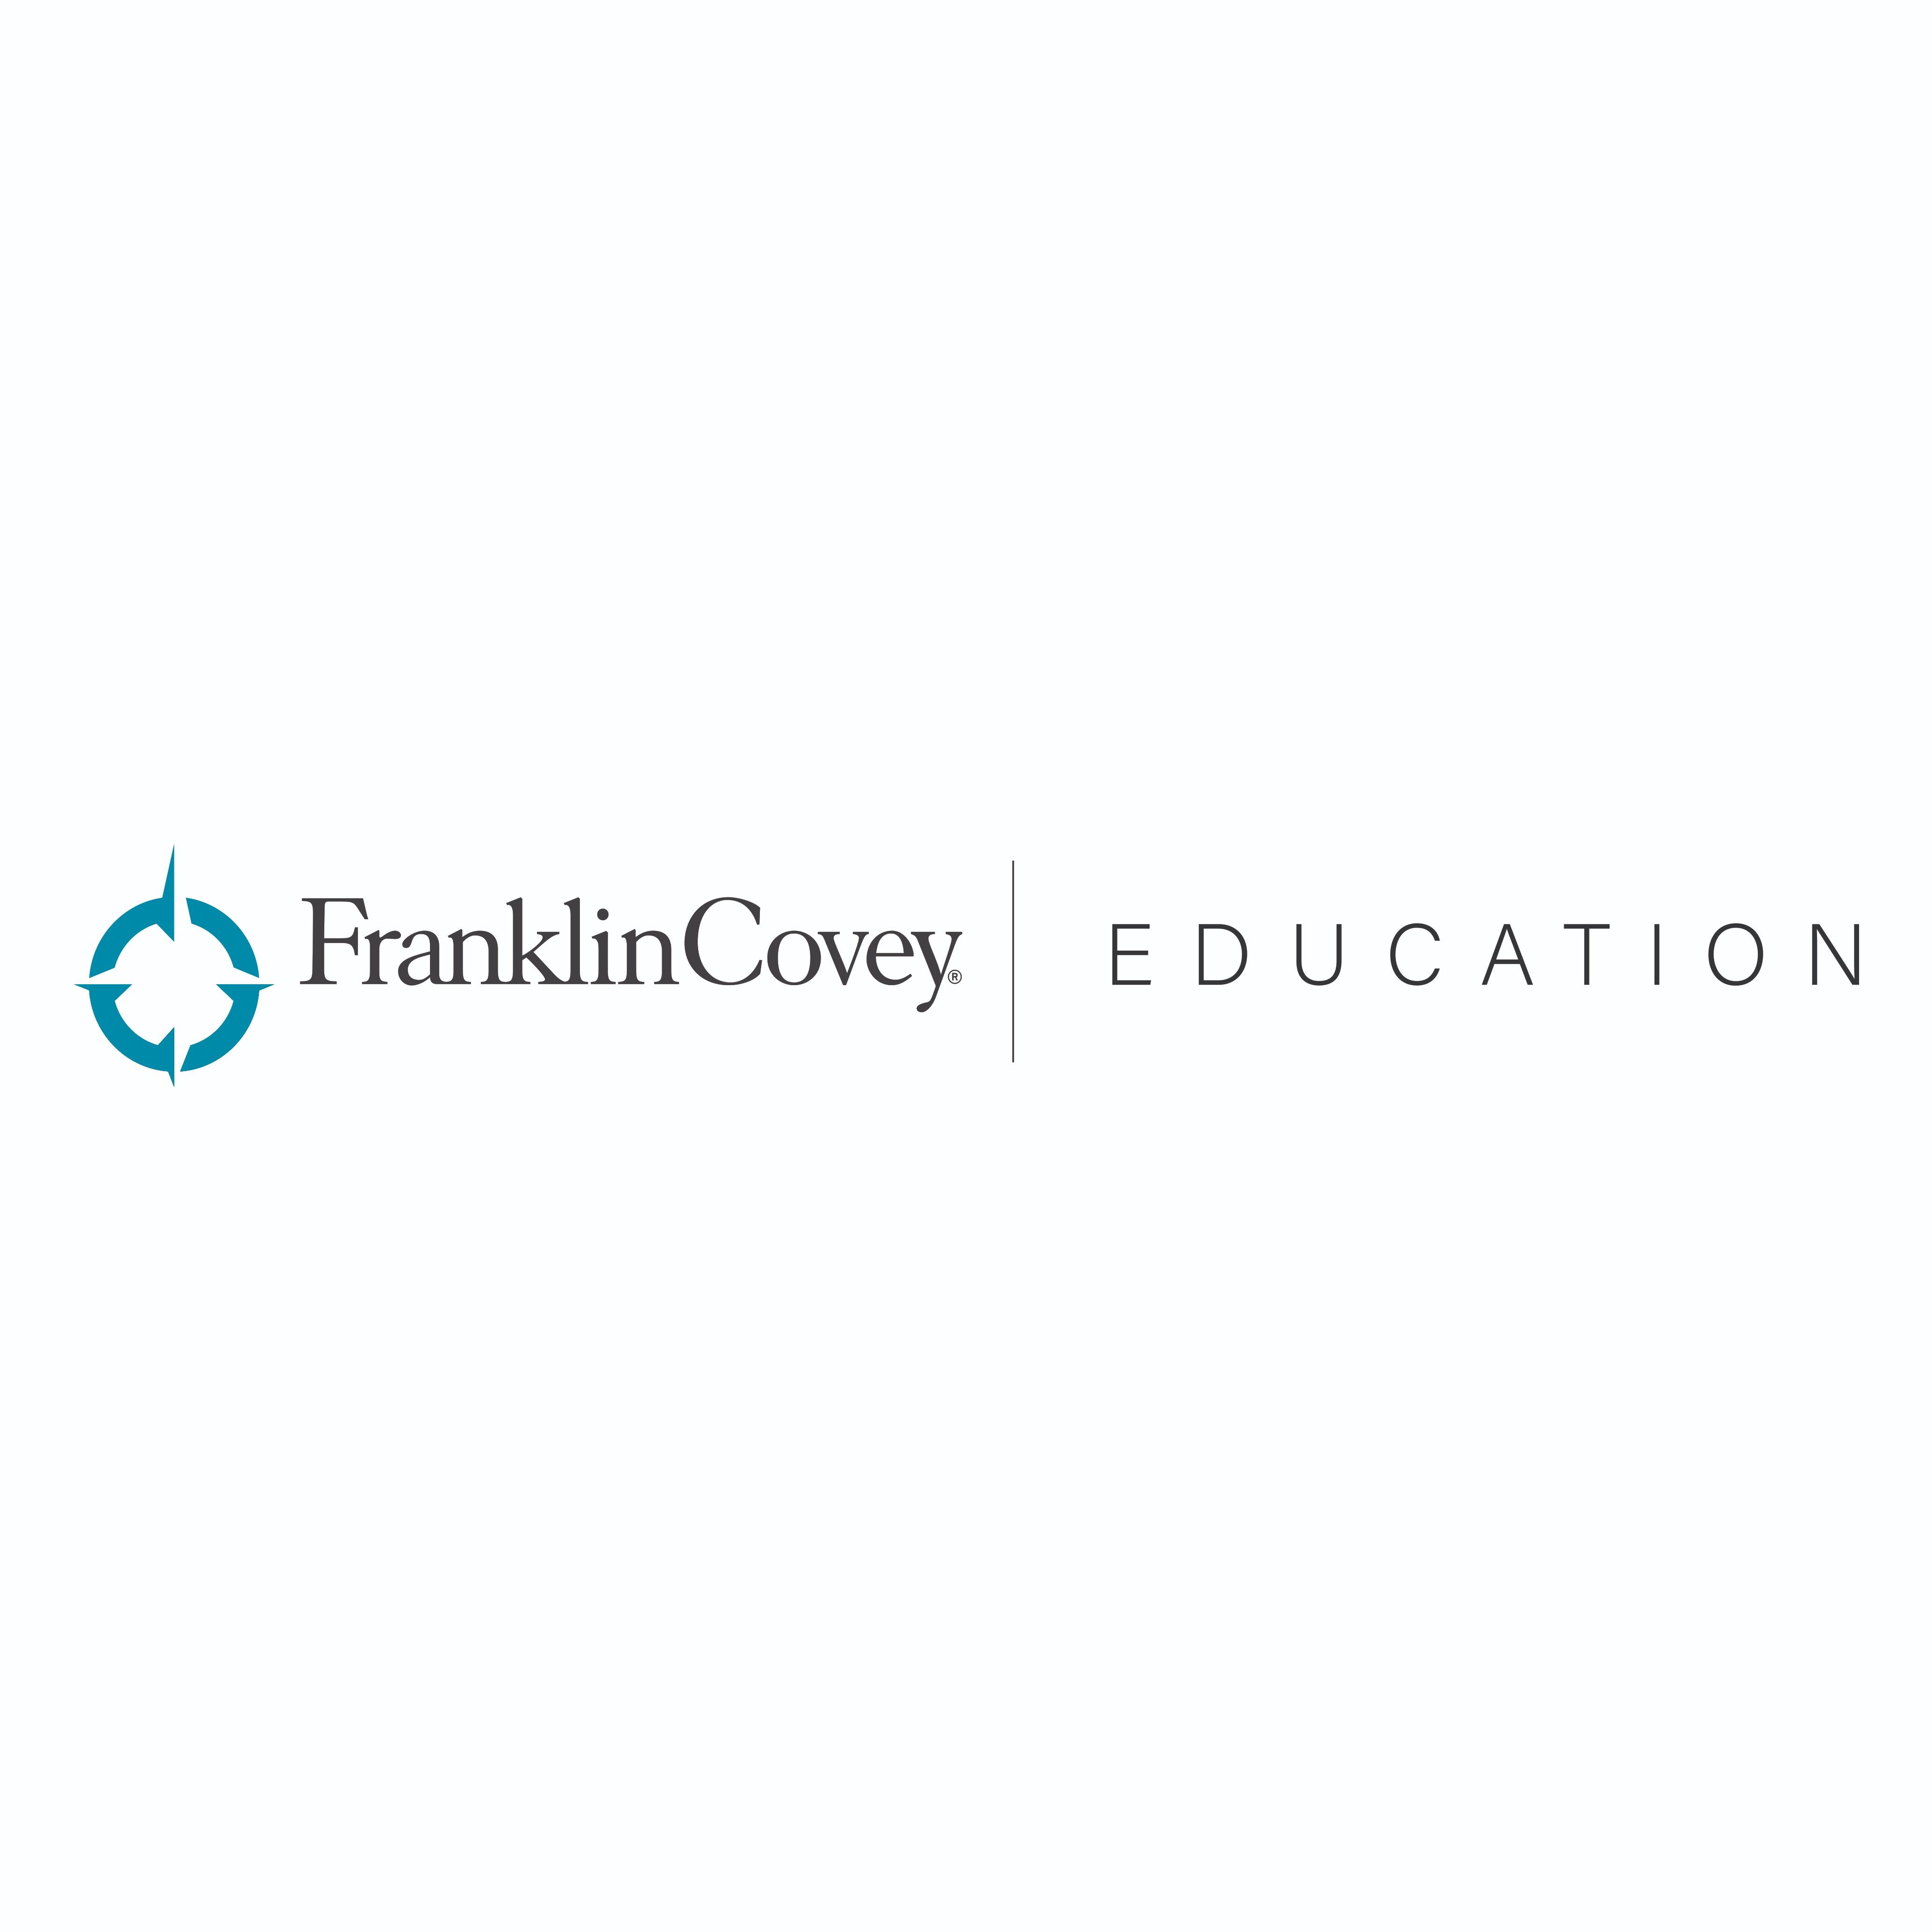 Logo FranklinCovey Education